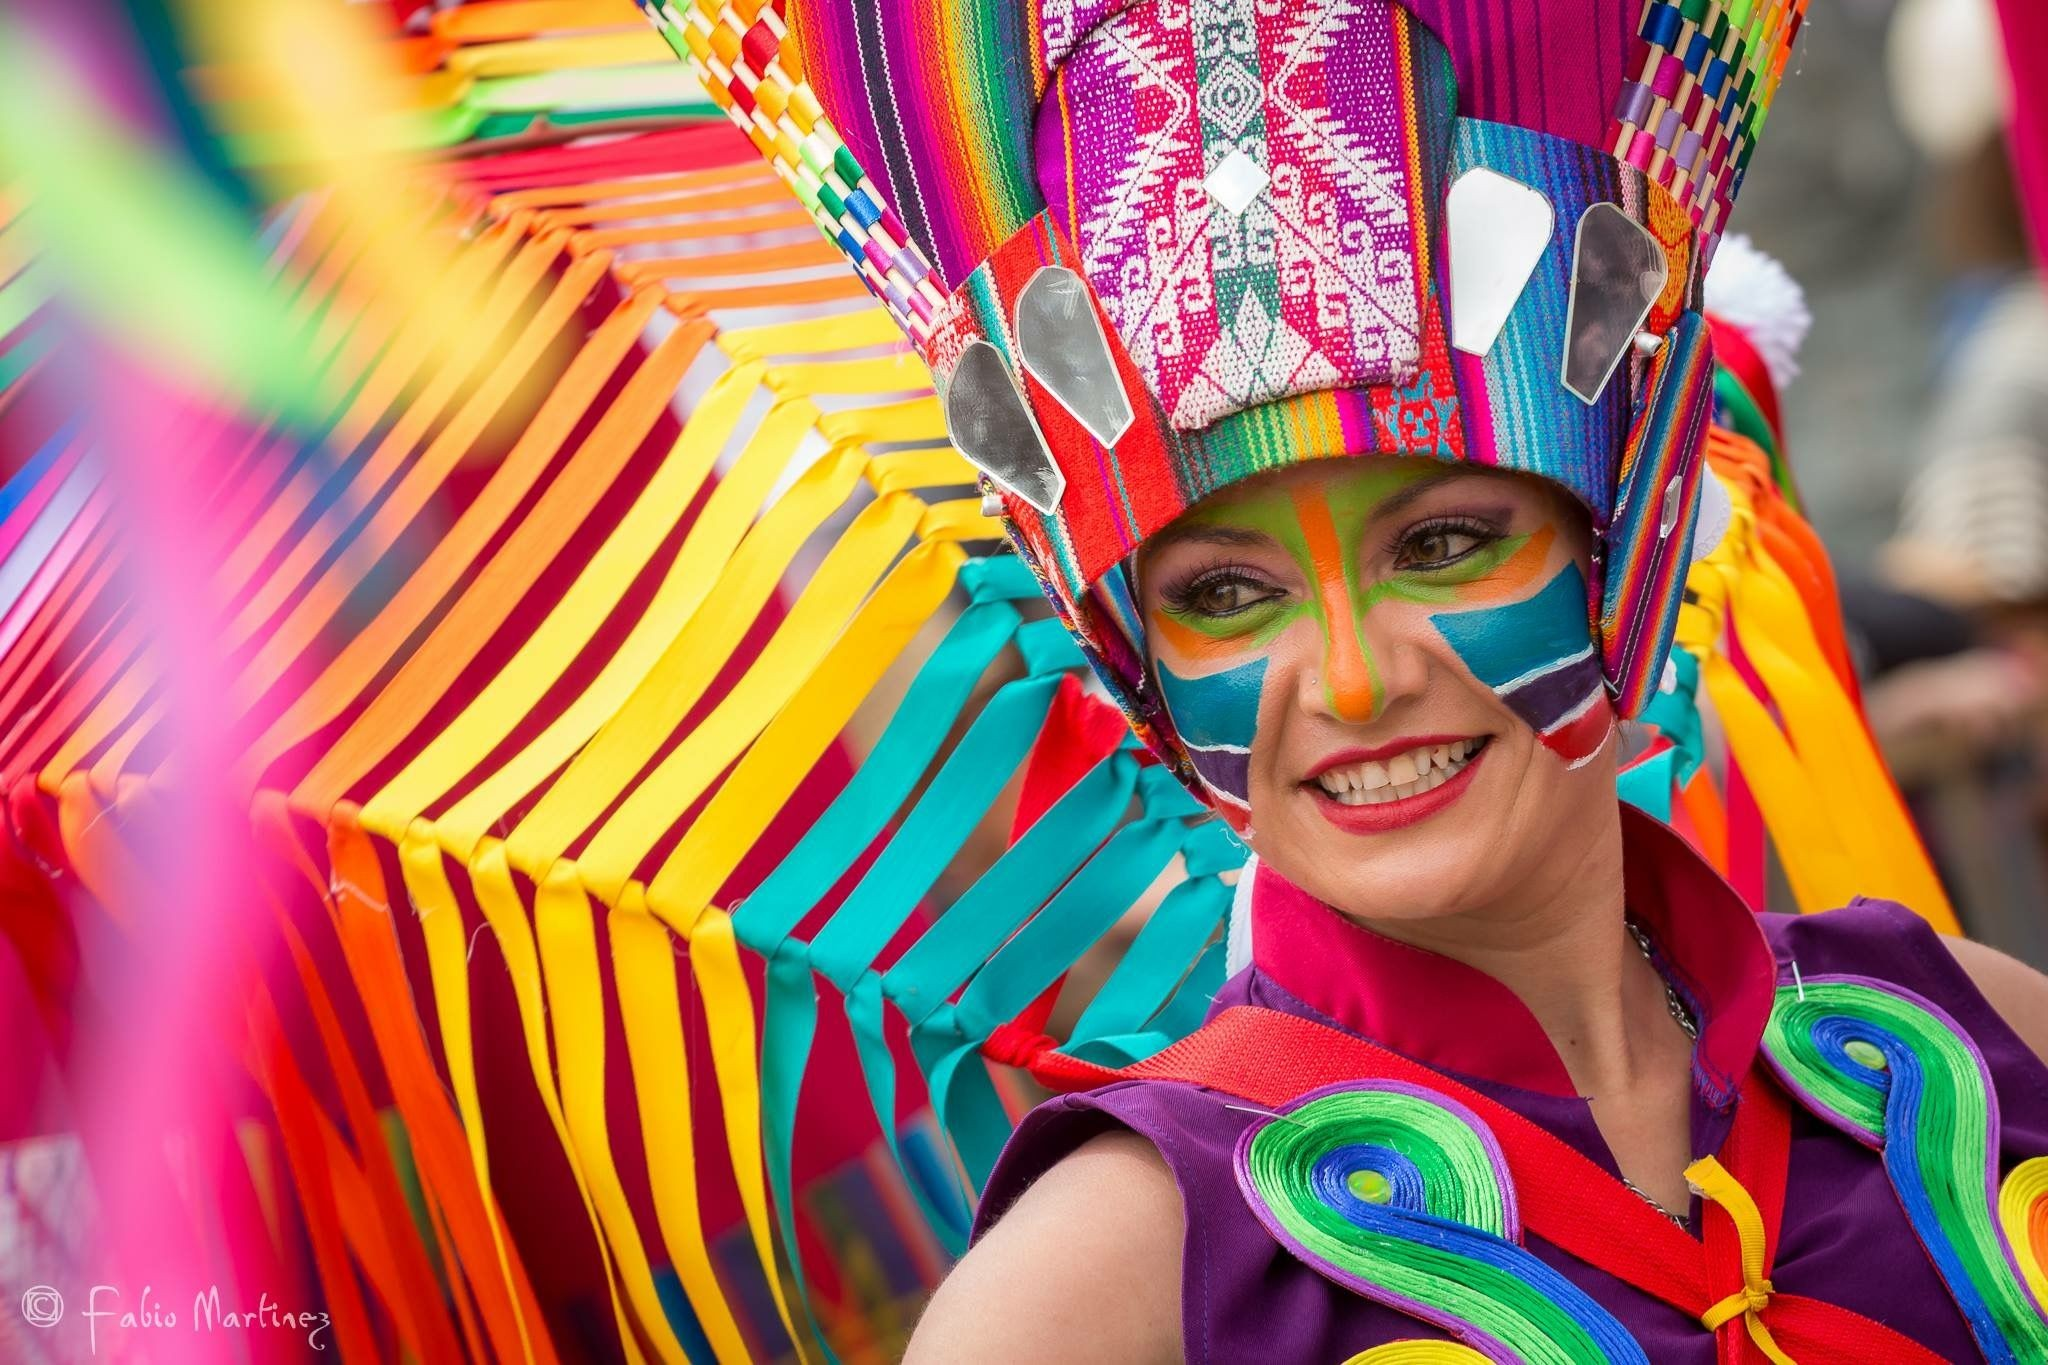 Carnavales blancos y negros Pasto 2017 Foto Fabio Martinez fabiomartinez foto